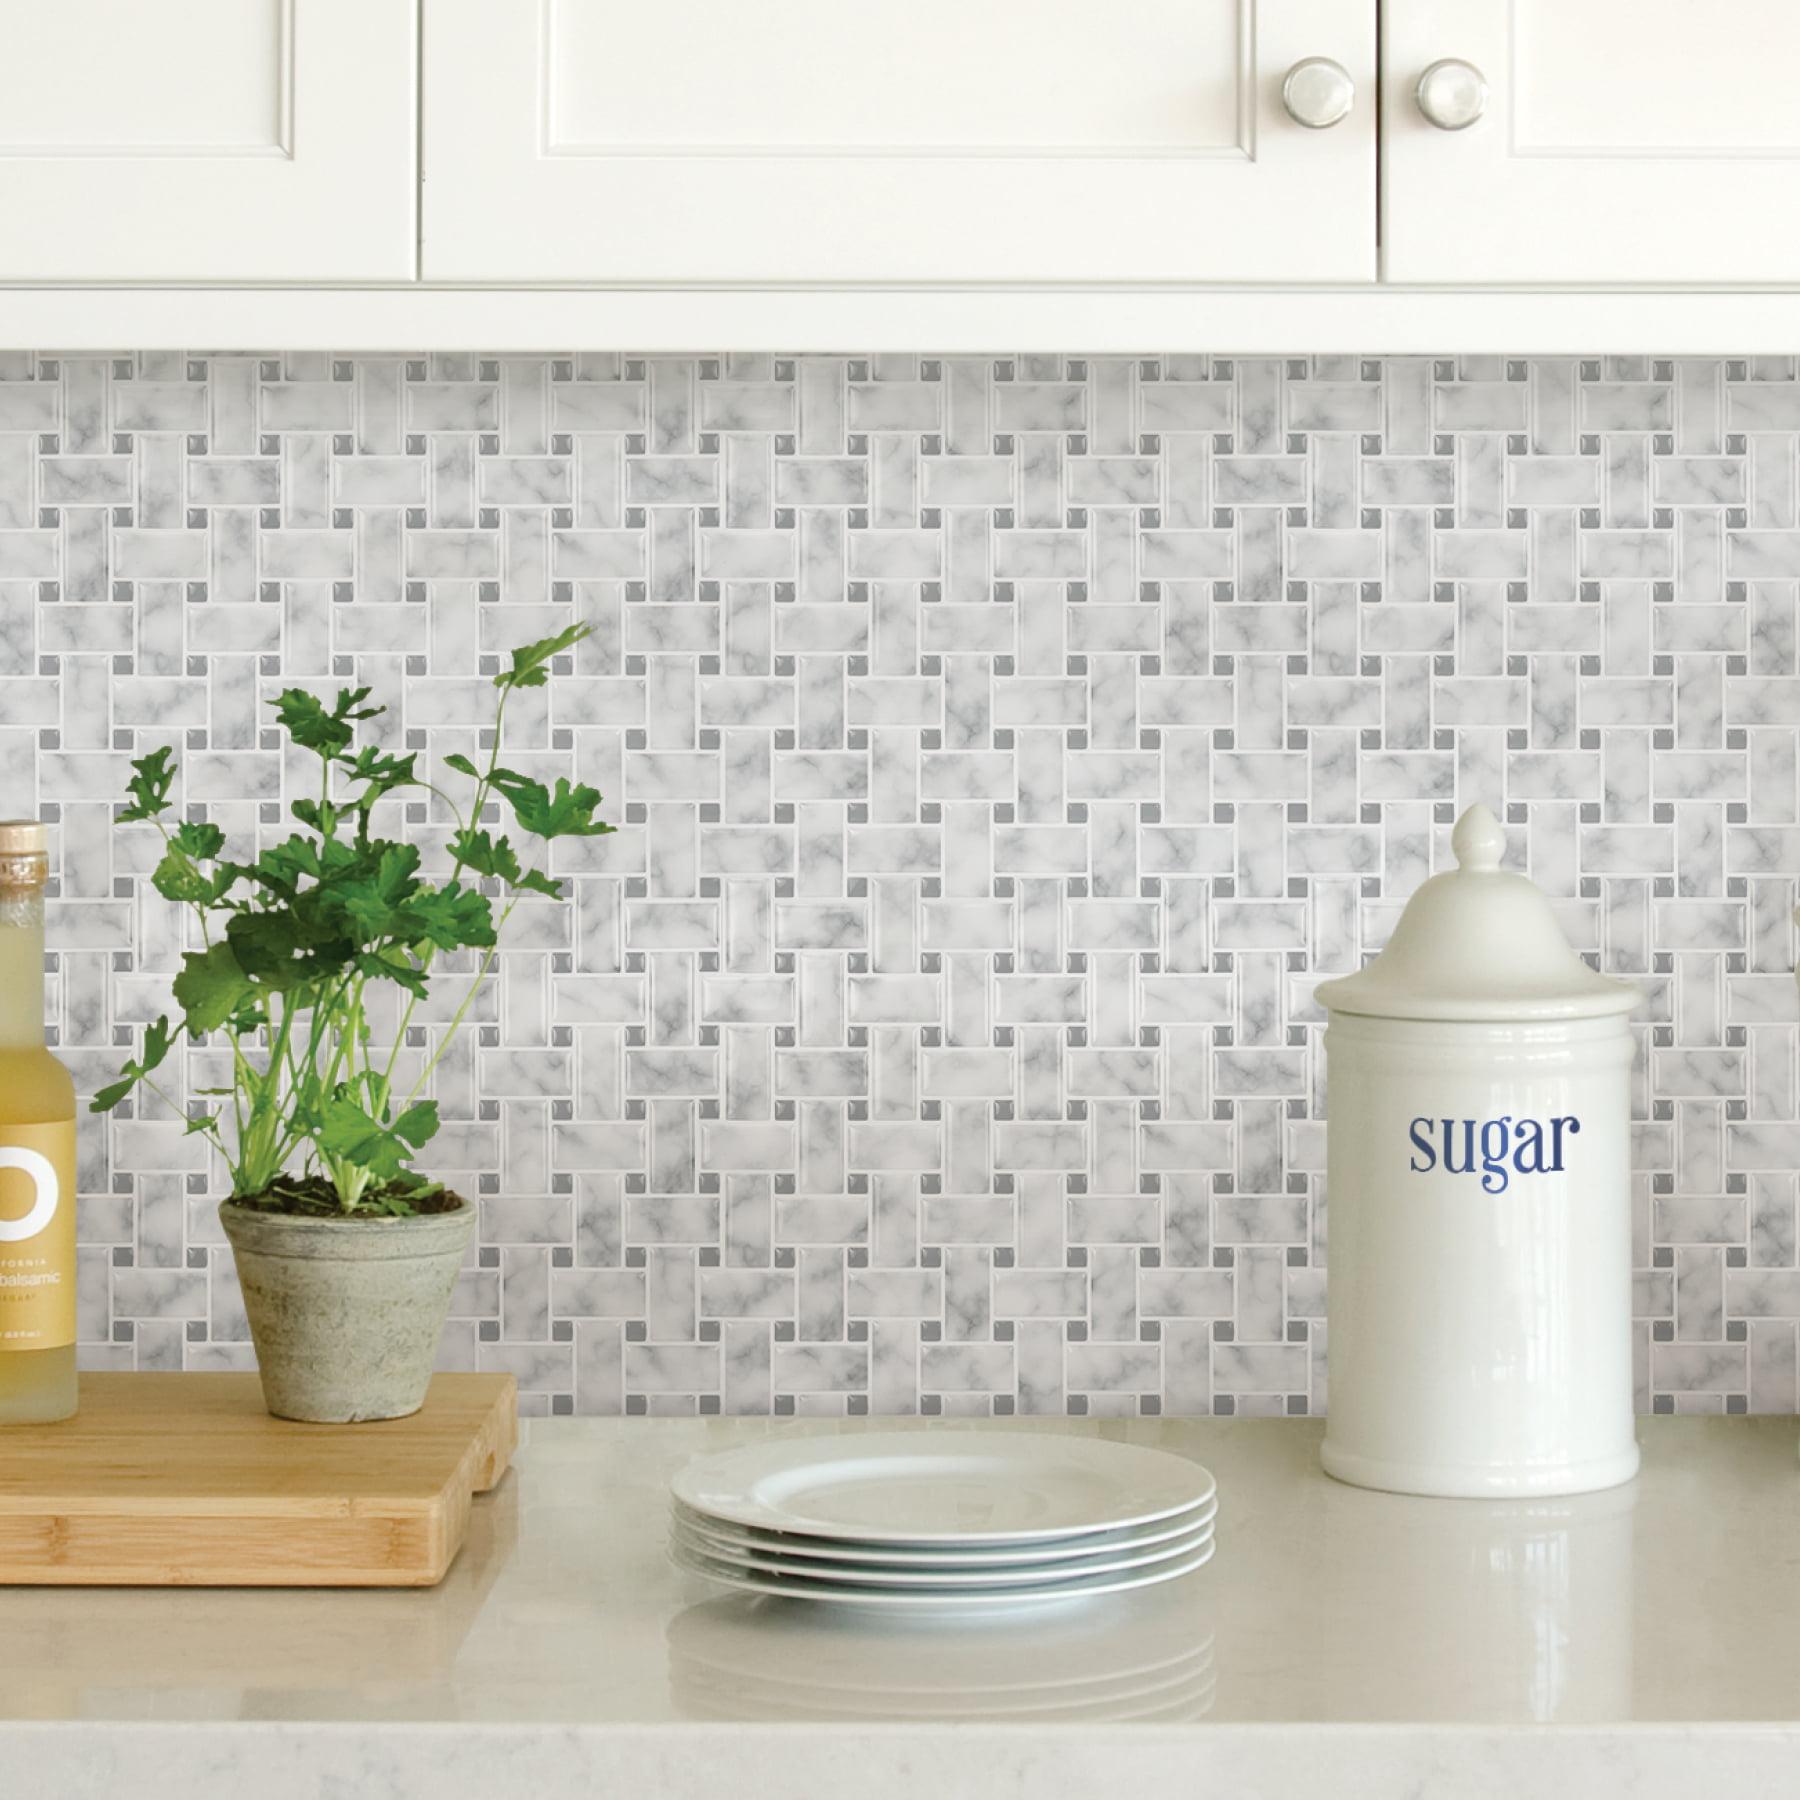 - InHome Basketweave Carrara Peel & Stick Backsplash Tiles - Walmart